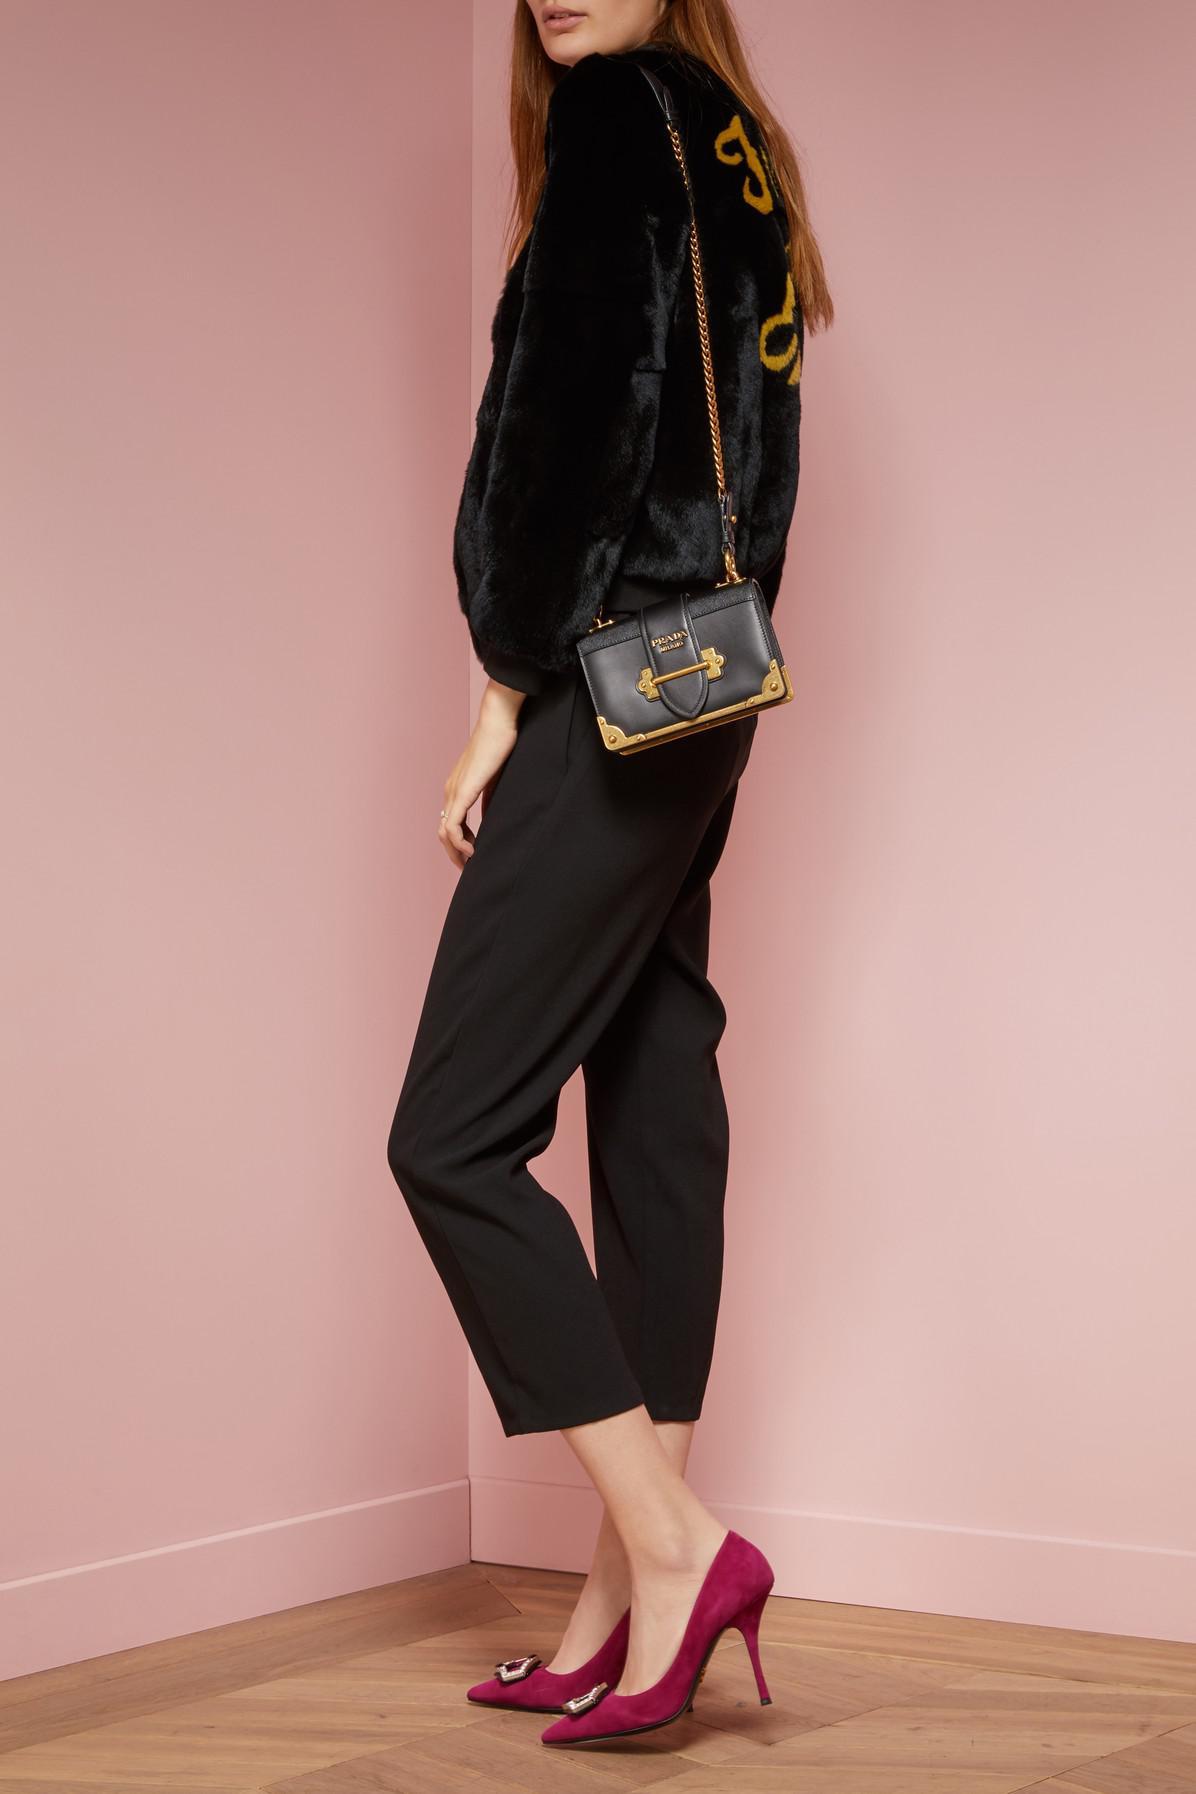 Lyst - Prada Mini Cahier Bag in Black 6a141765c52b8